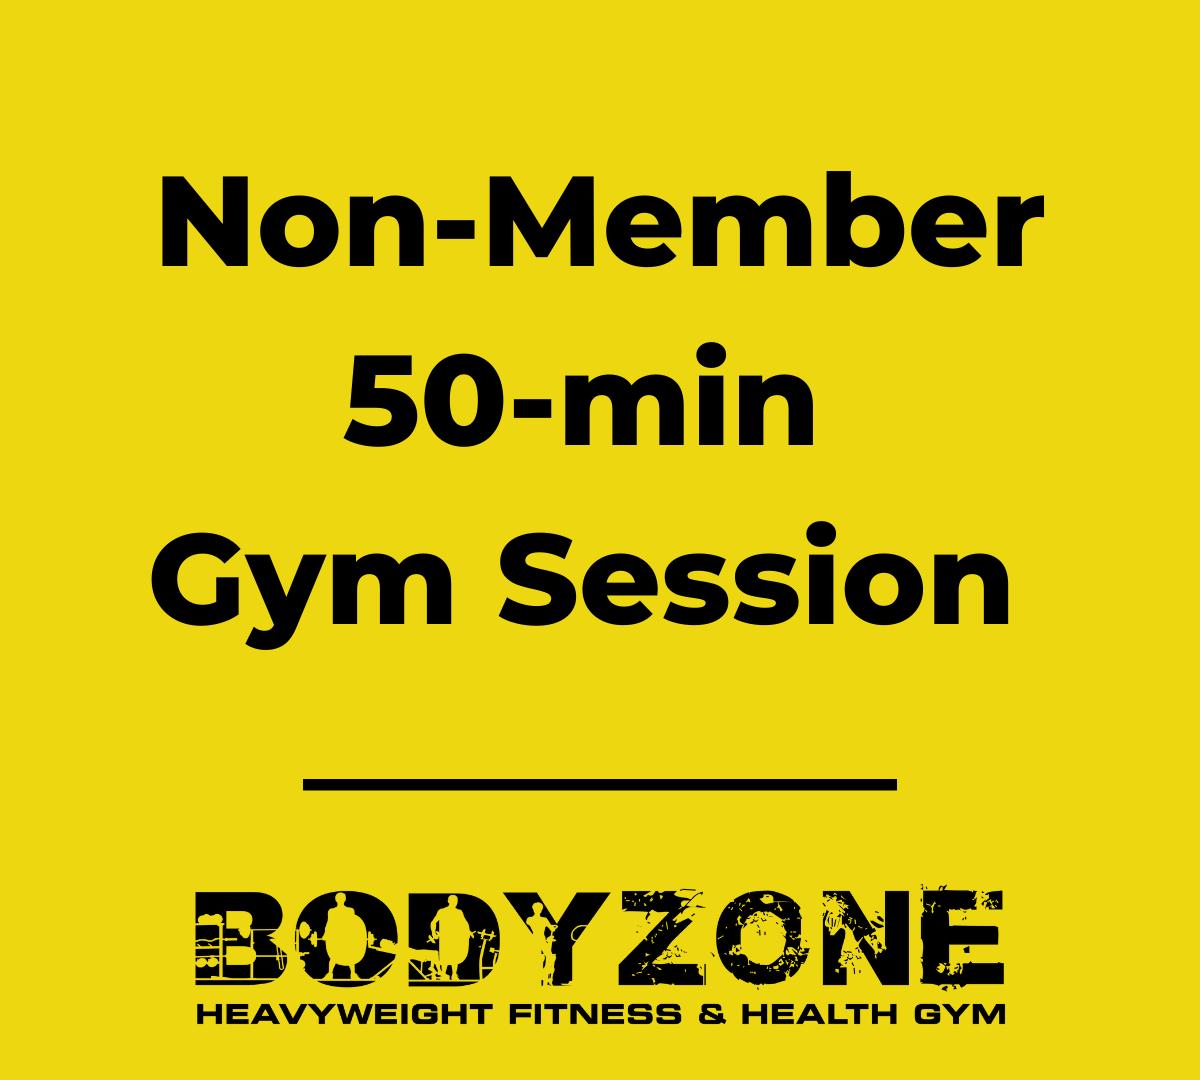 50-min Non-Member Gym Session